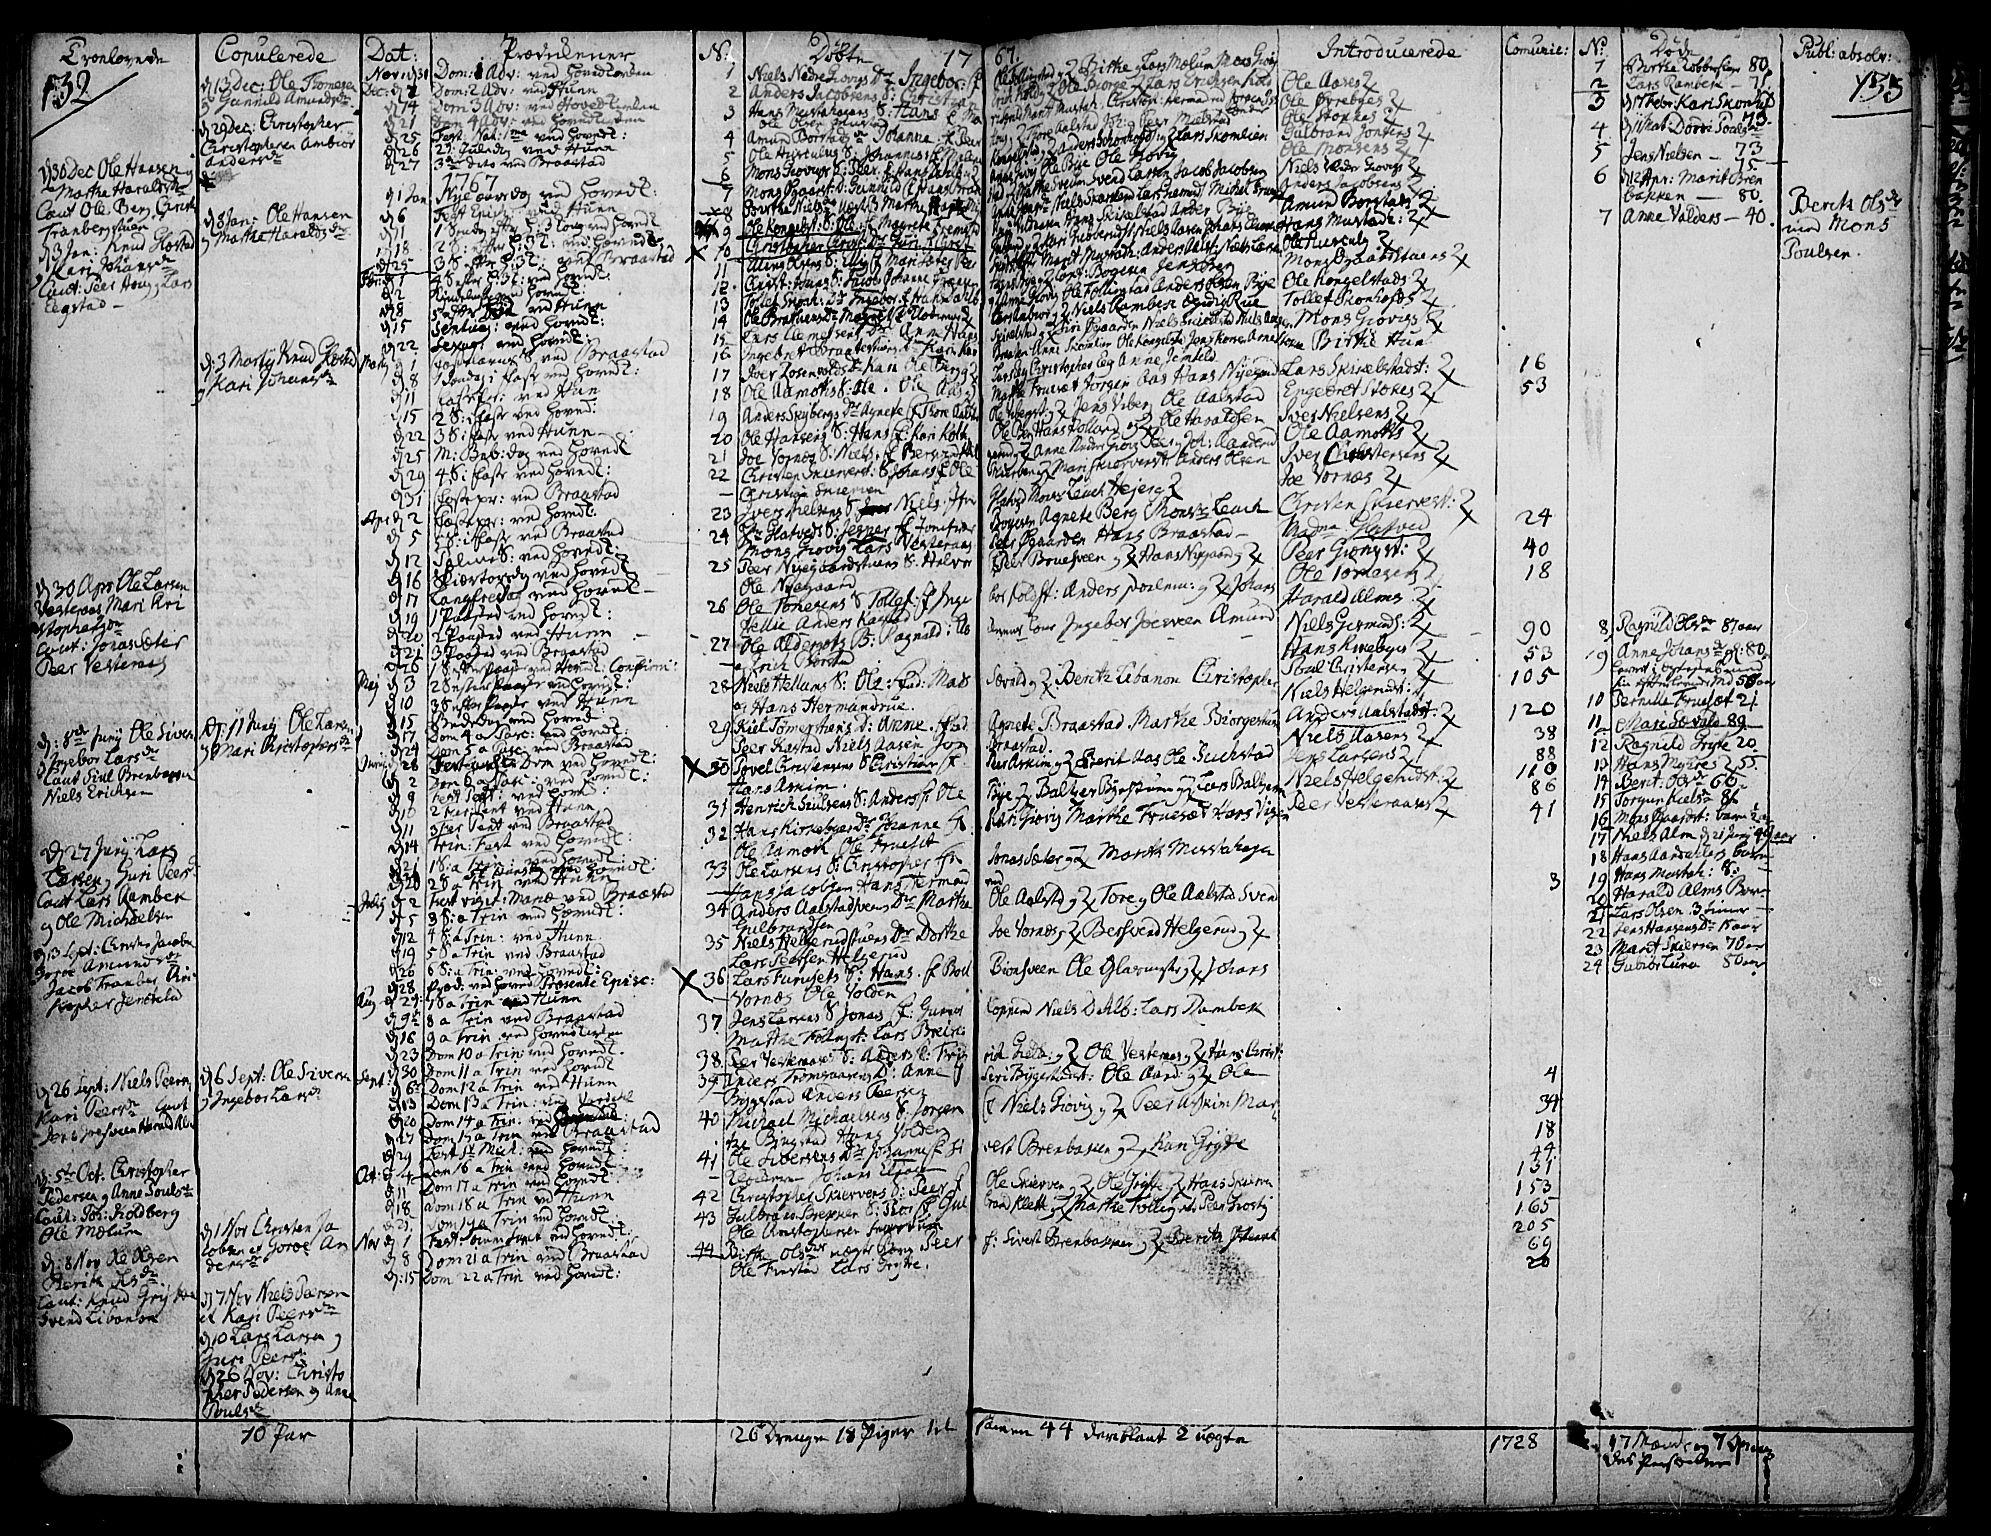 SAH, Vardal prestekontor, H/Ha/Haa/L0002: Ministerialbok nr. 2, 1748-1776, s. 132-133